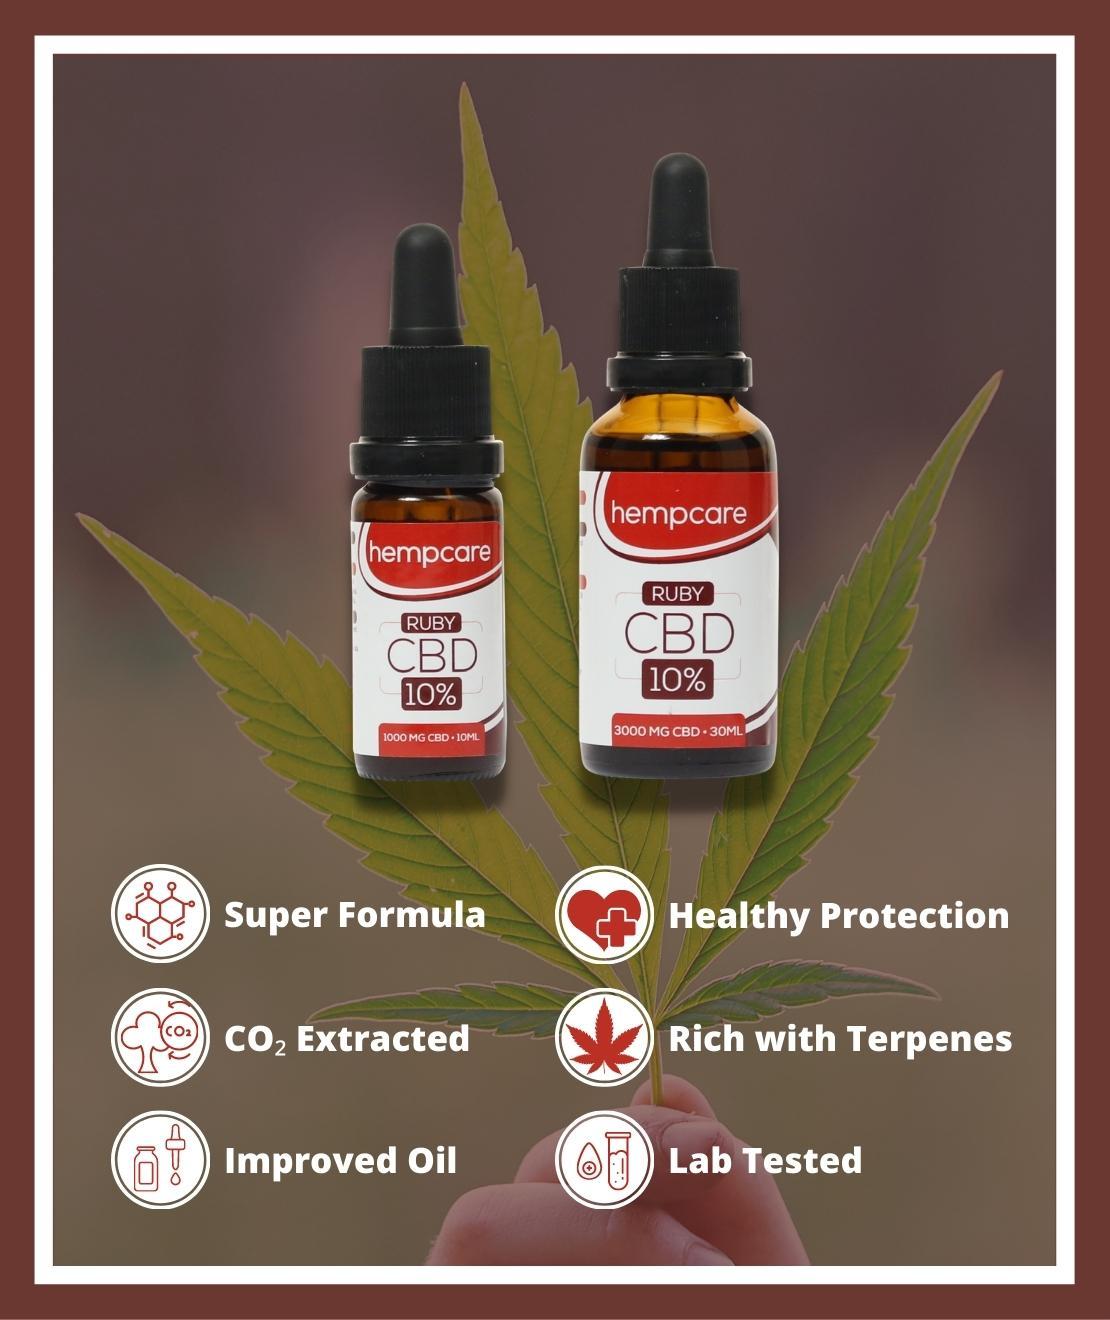 Hempcare Ruby CBD Oil